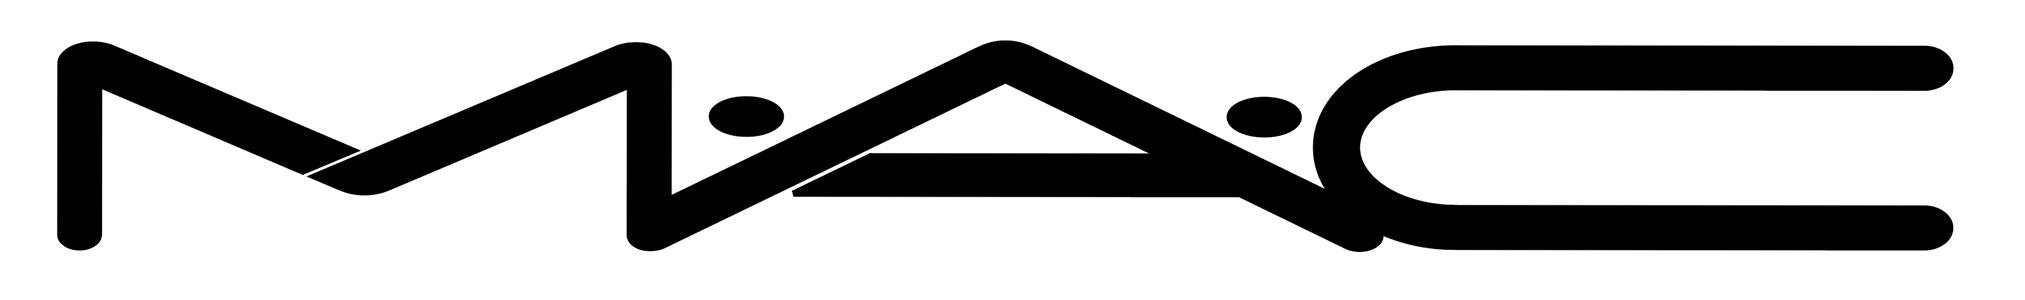 mac_logo_logotype-copy